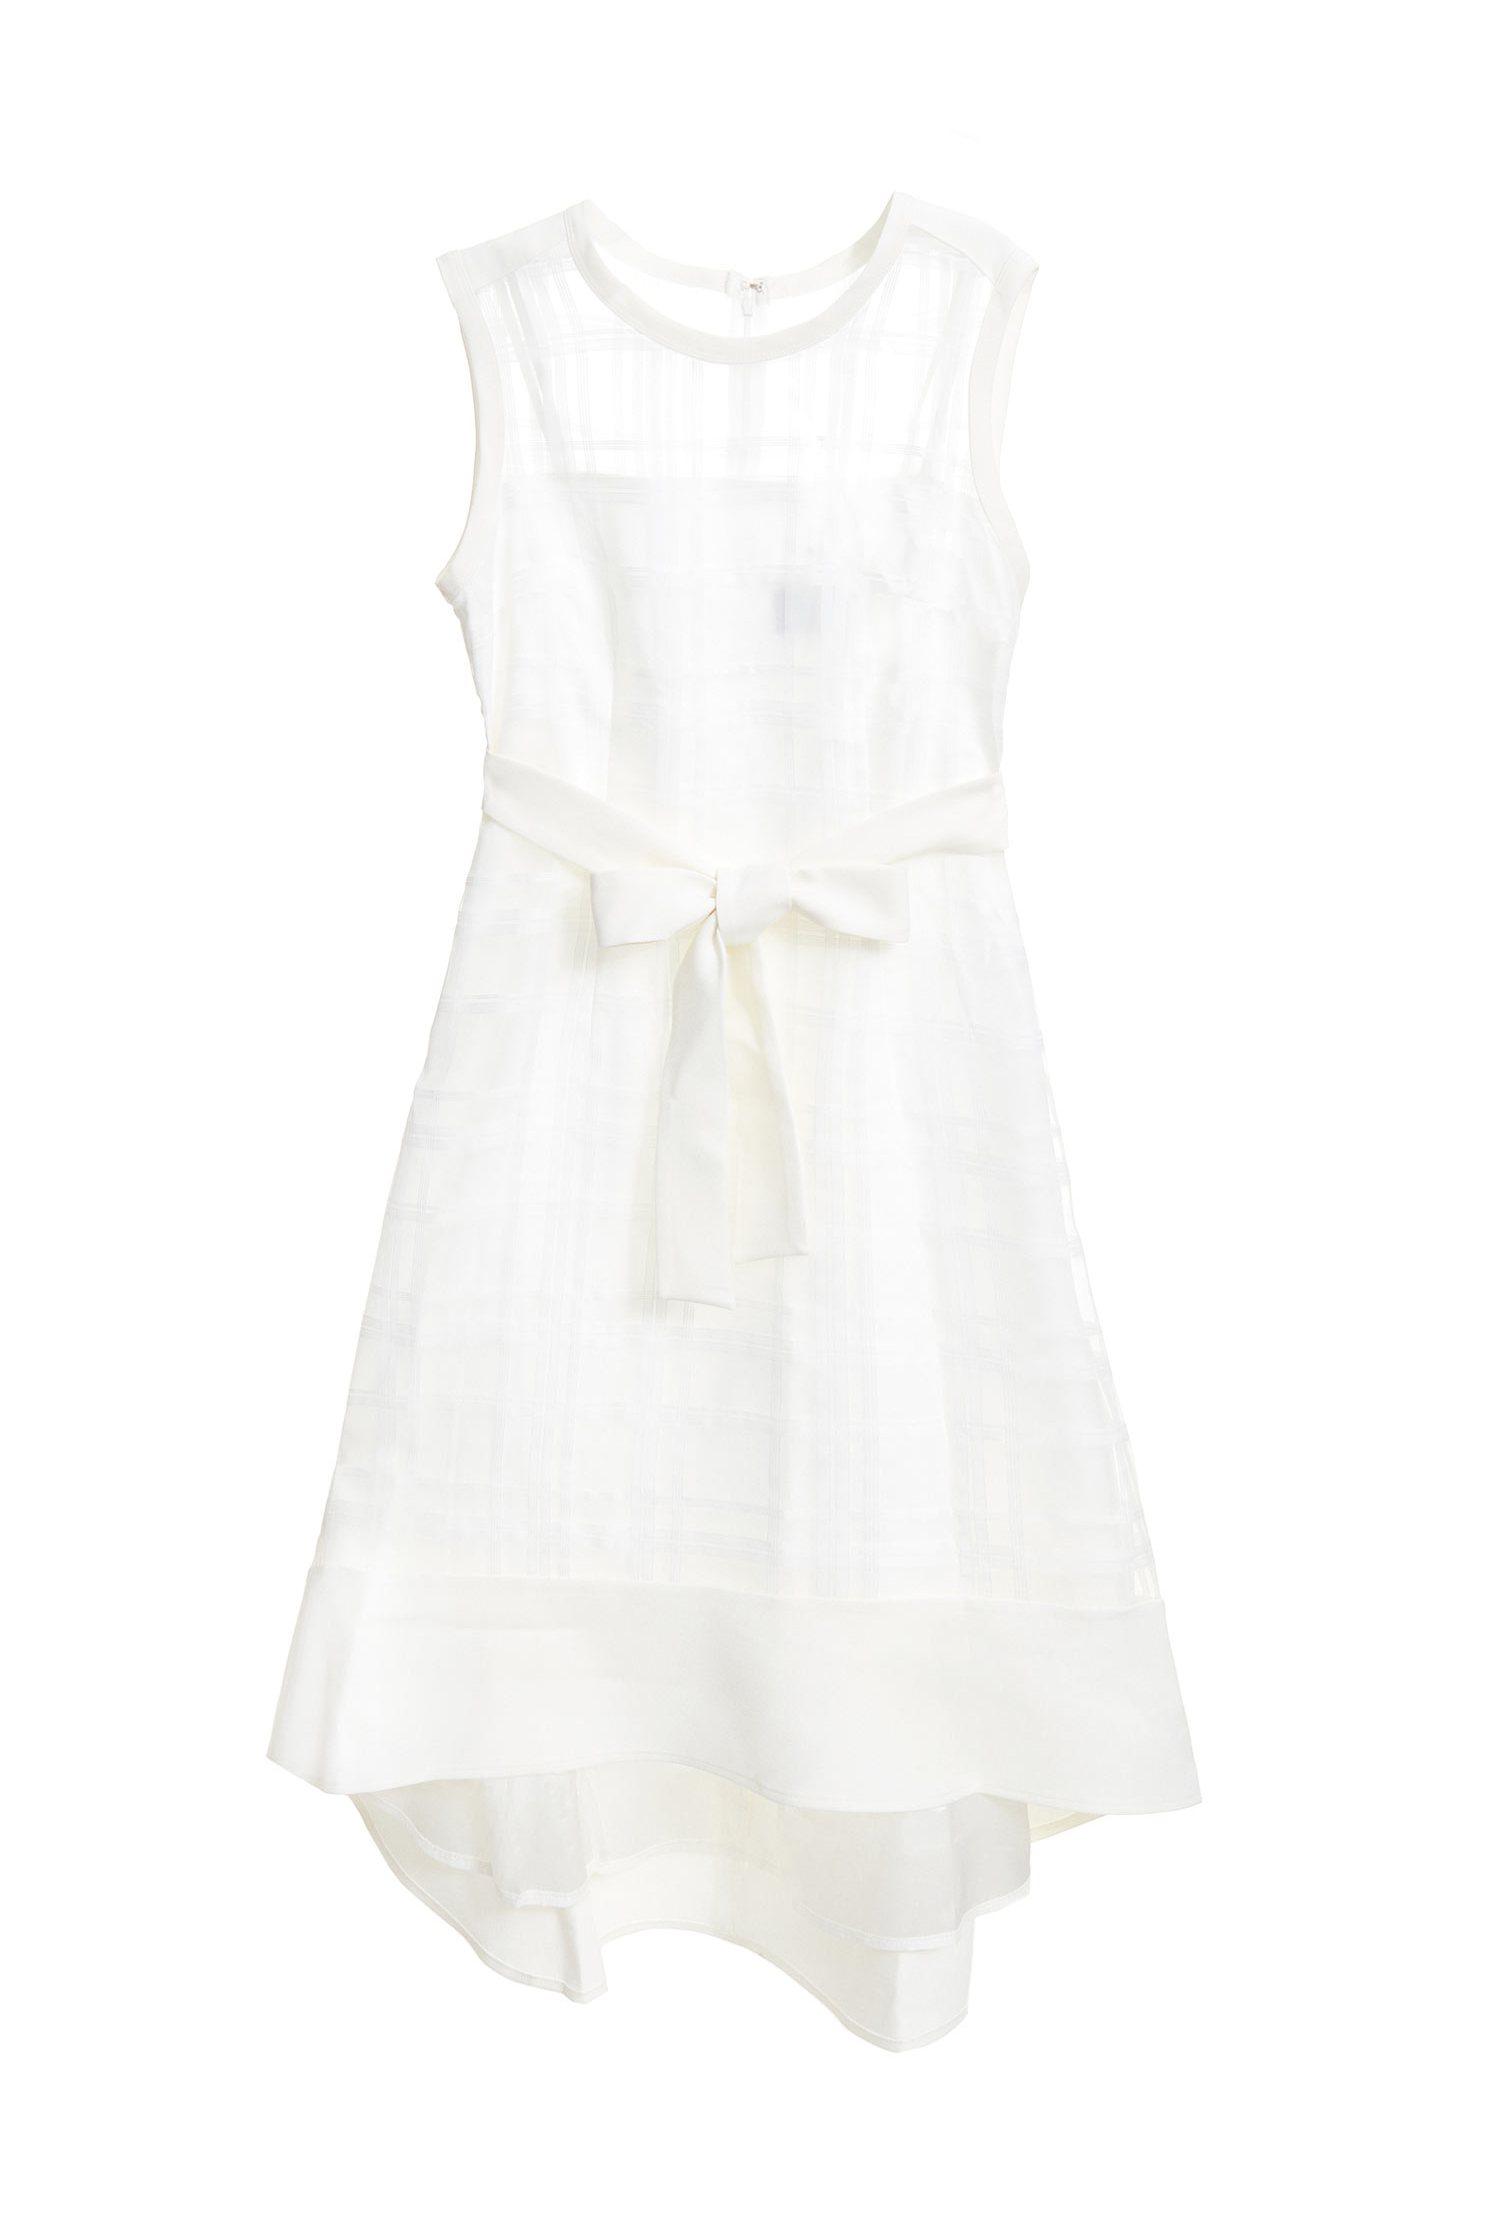 Romantic sleeveless dress